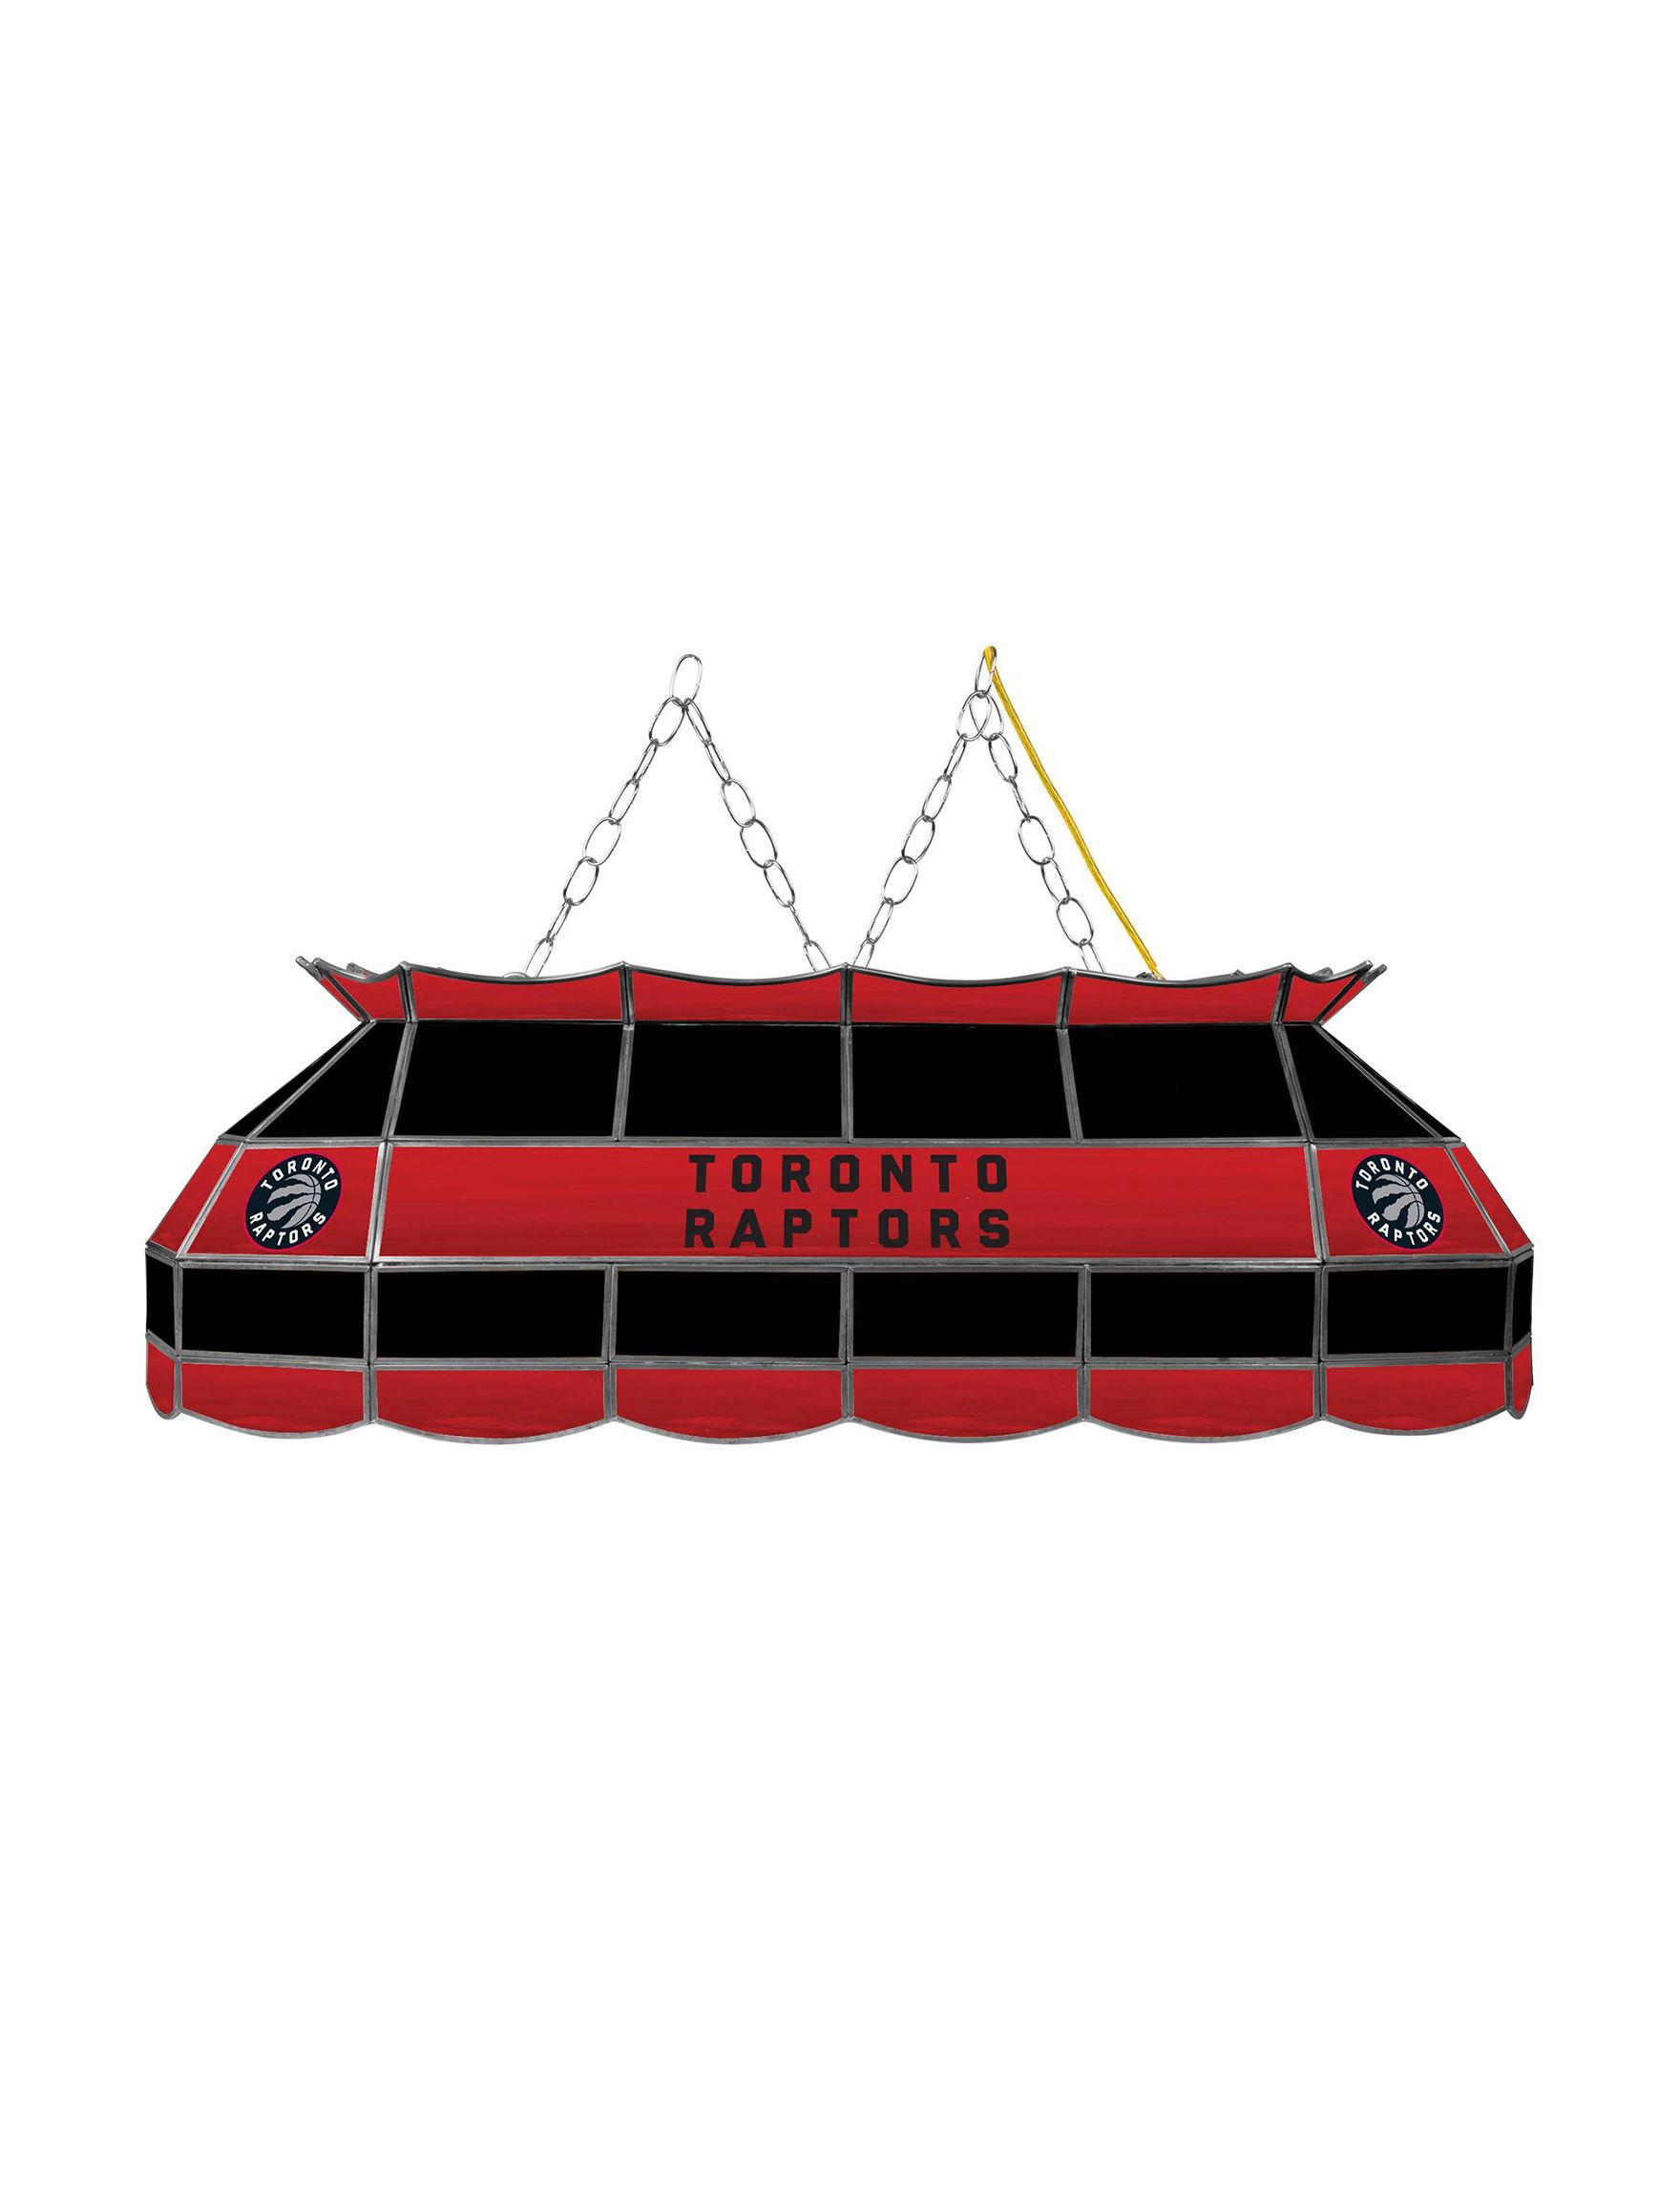 NBA Black / Red / White Chandeliers Lights & Lanterns Lighting & Lamps